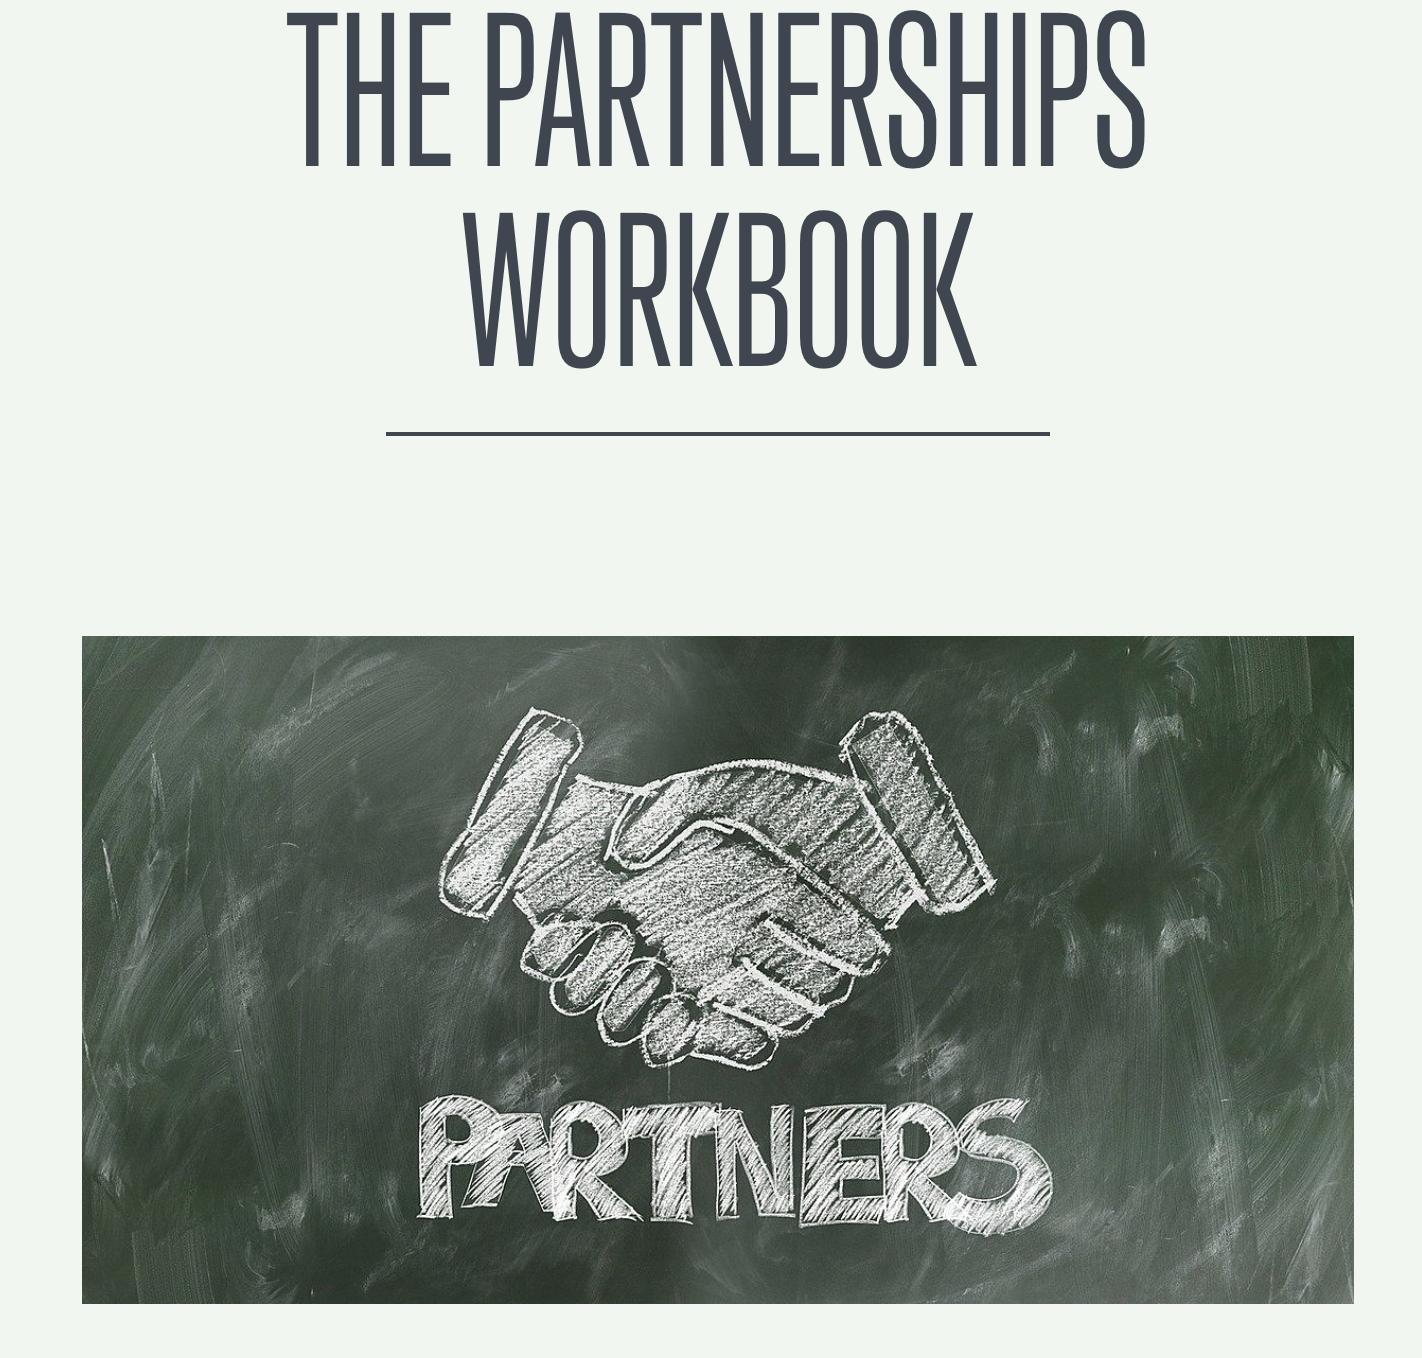 The Partnerships Workbook by Clinton Senkow